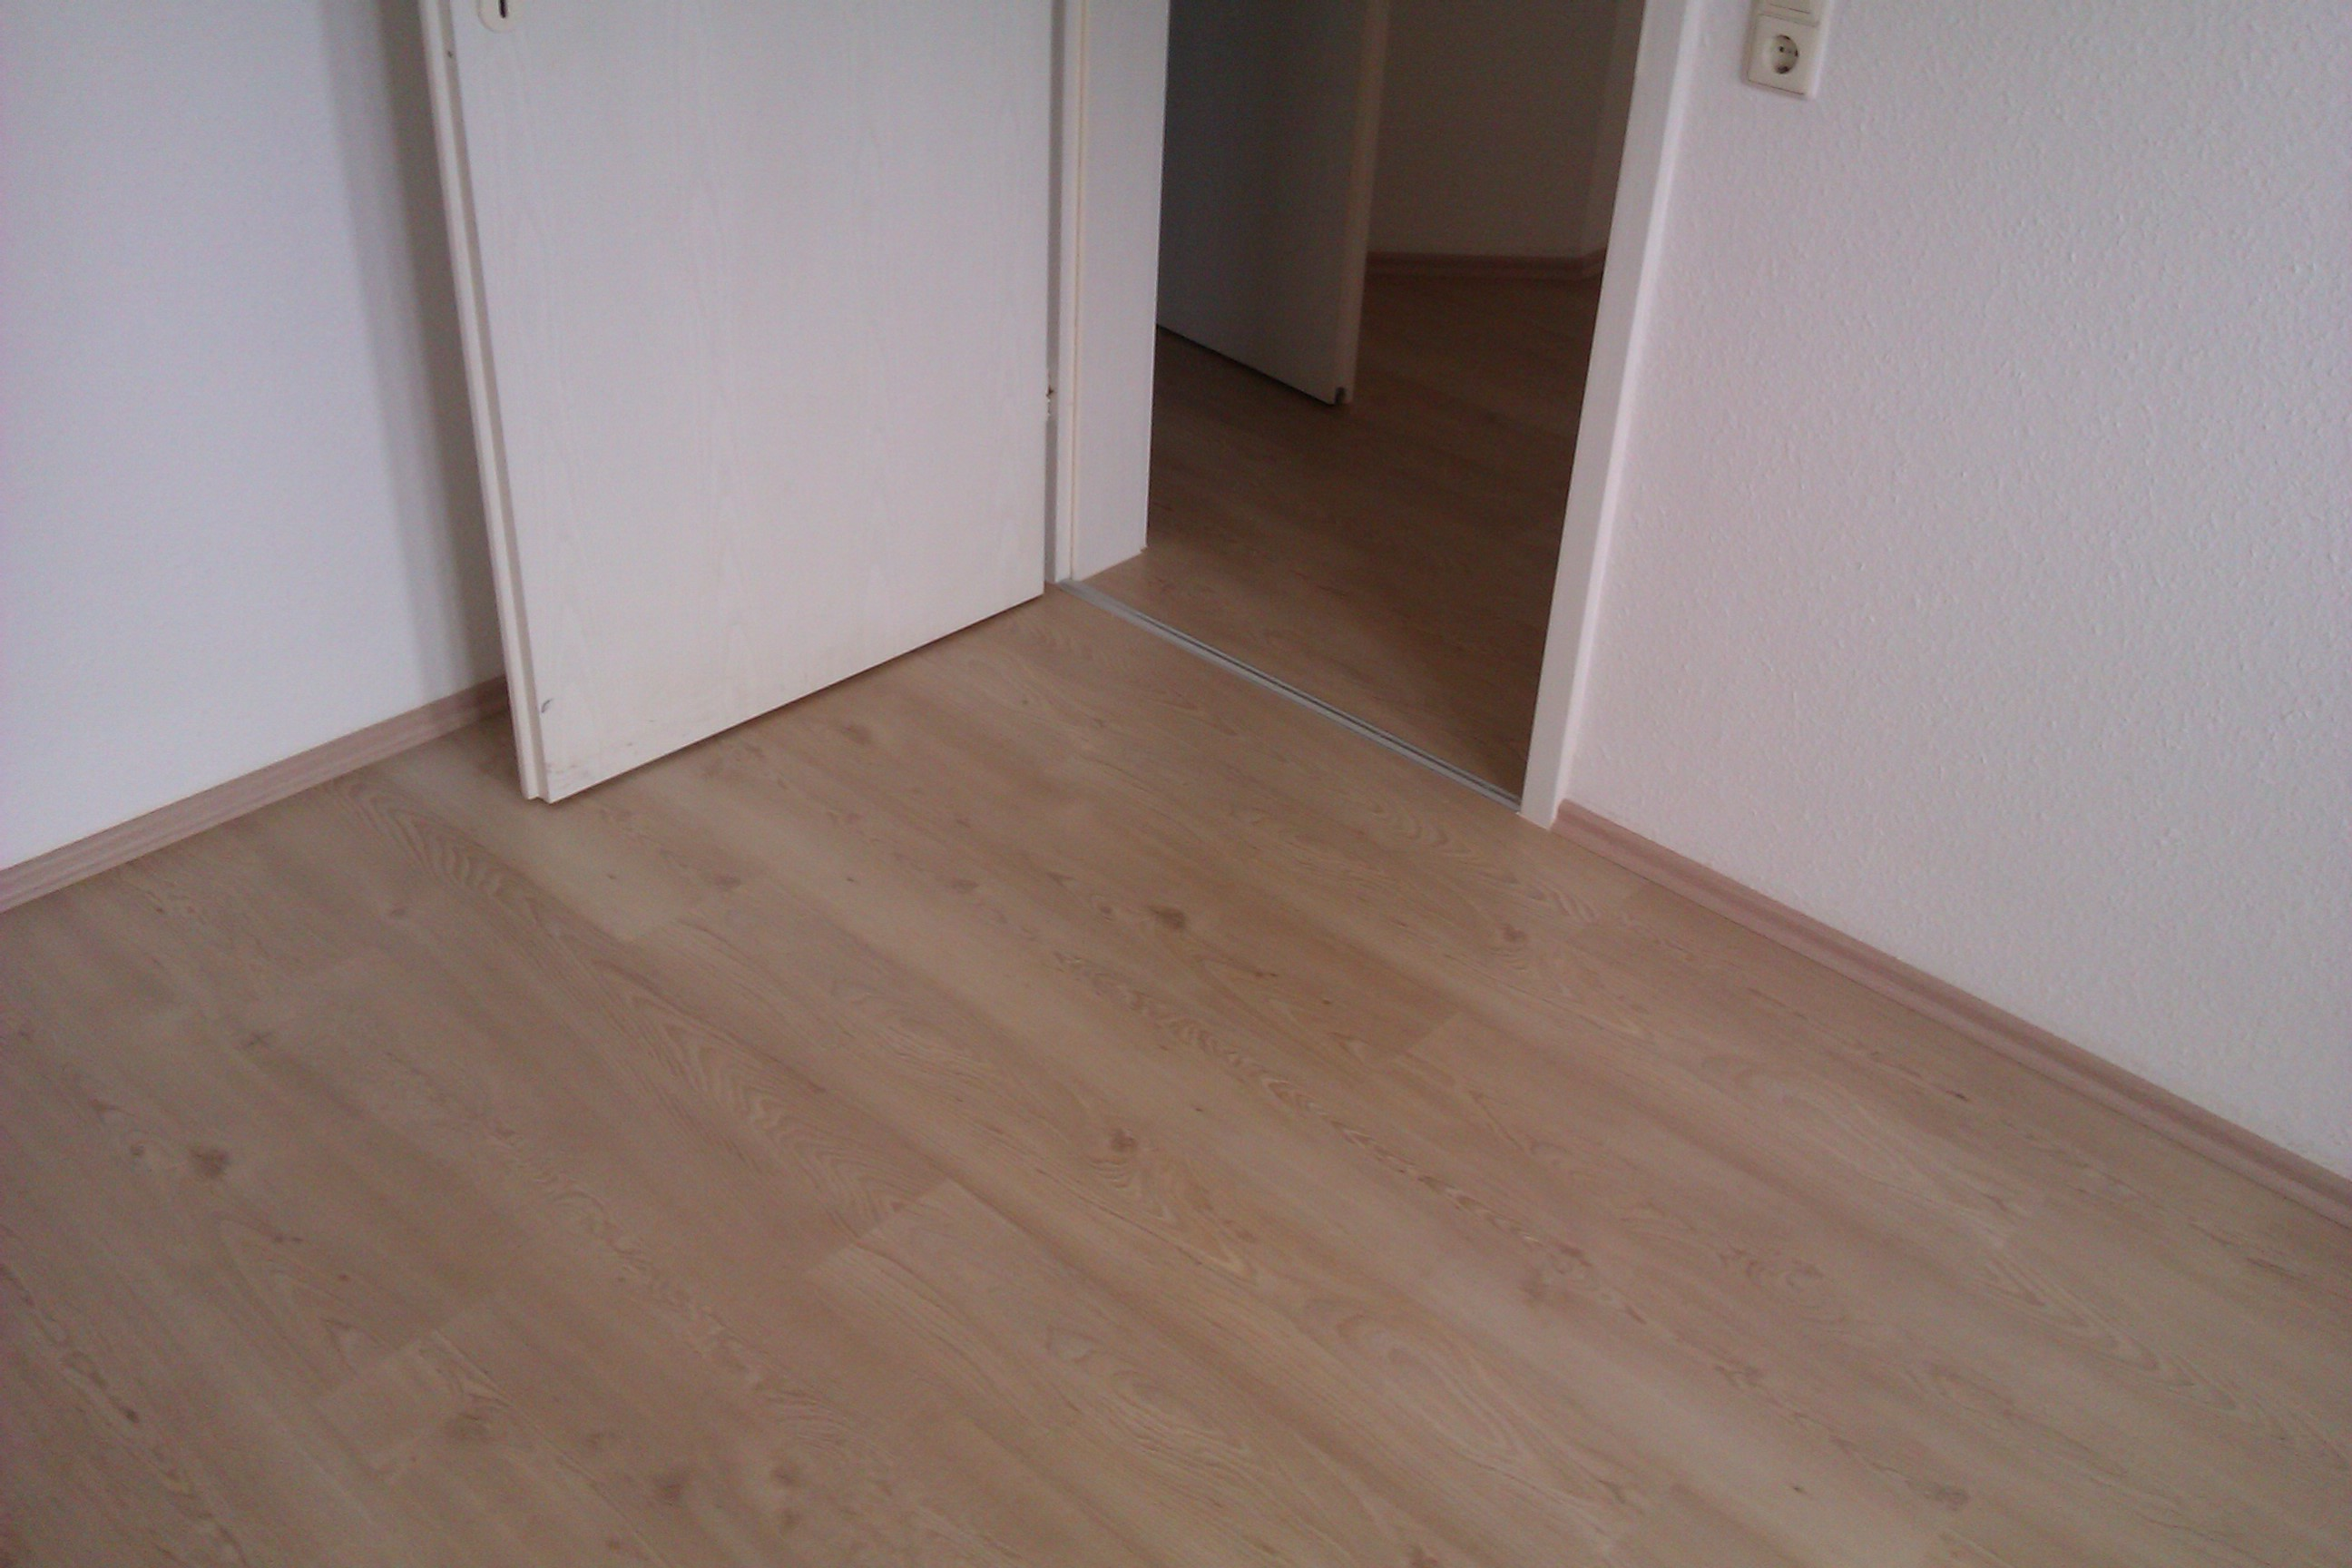 parkett laminat vinyl. Black Bedroom Furniture Sets. Home Design Ideas